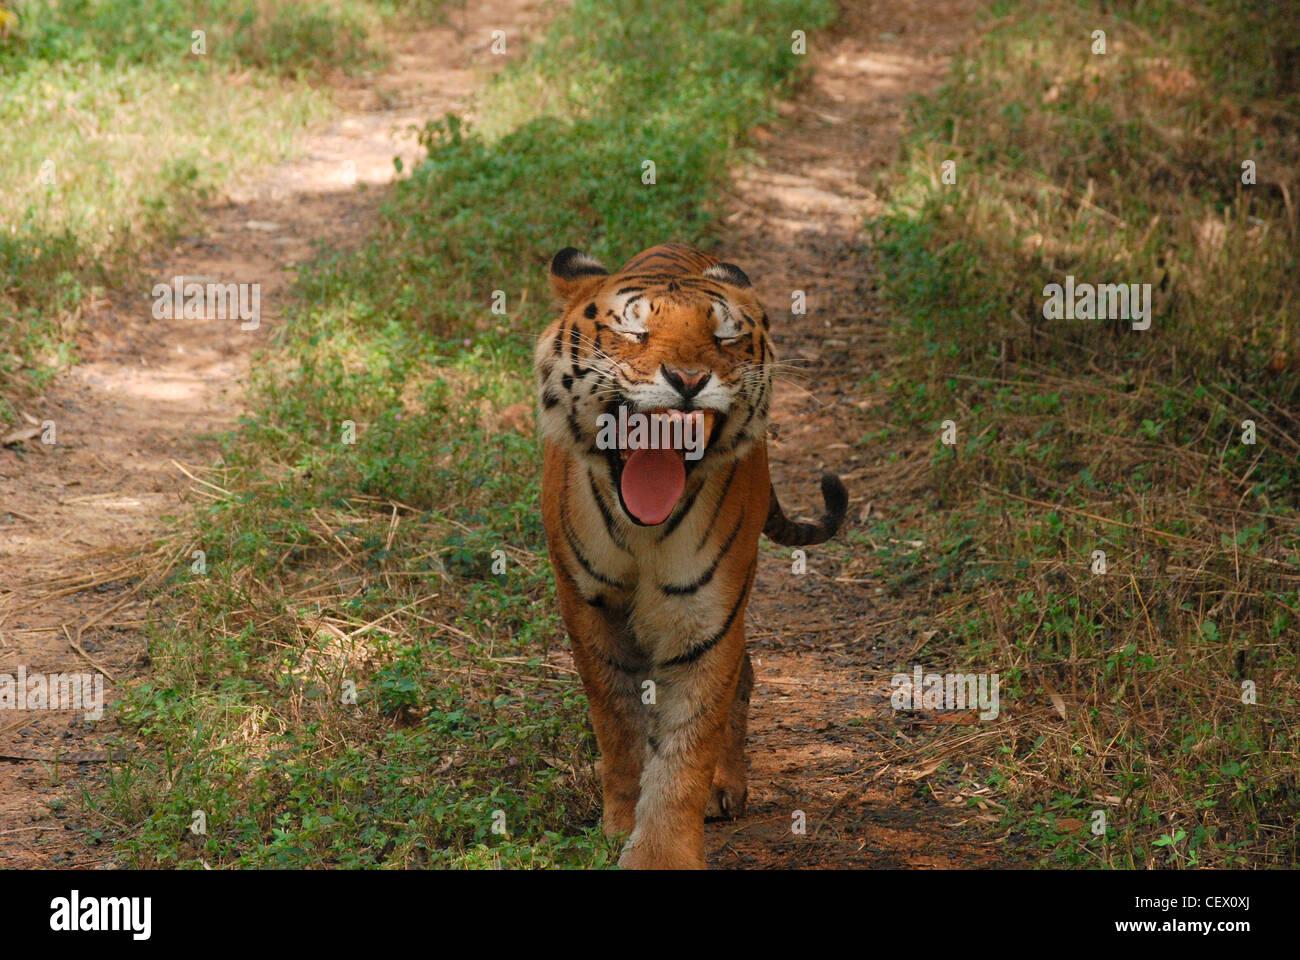 tiger yawning; wild life sanctuary, india. bengal tiger is the national  animal of india. - Stock Image